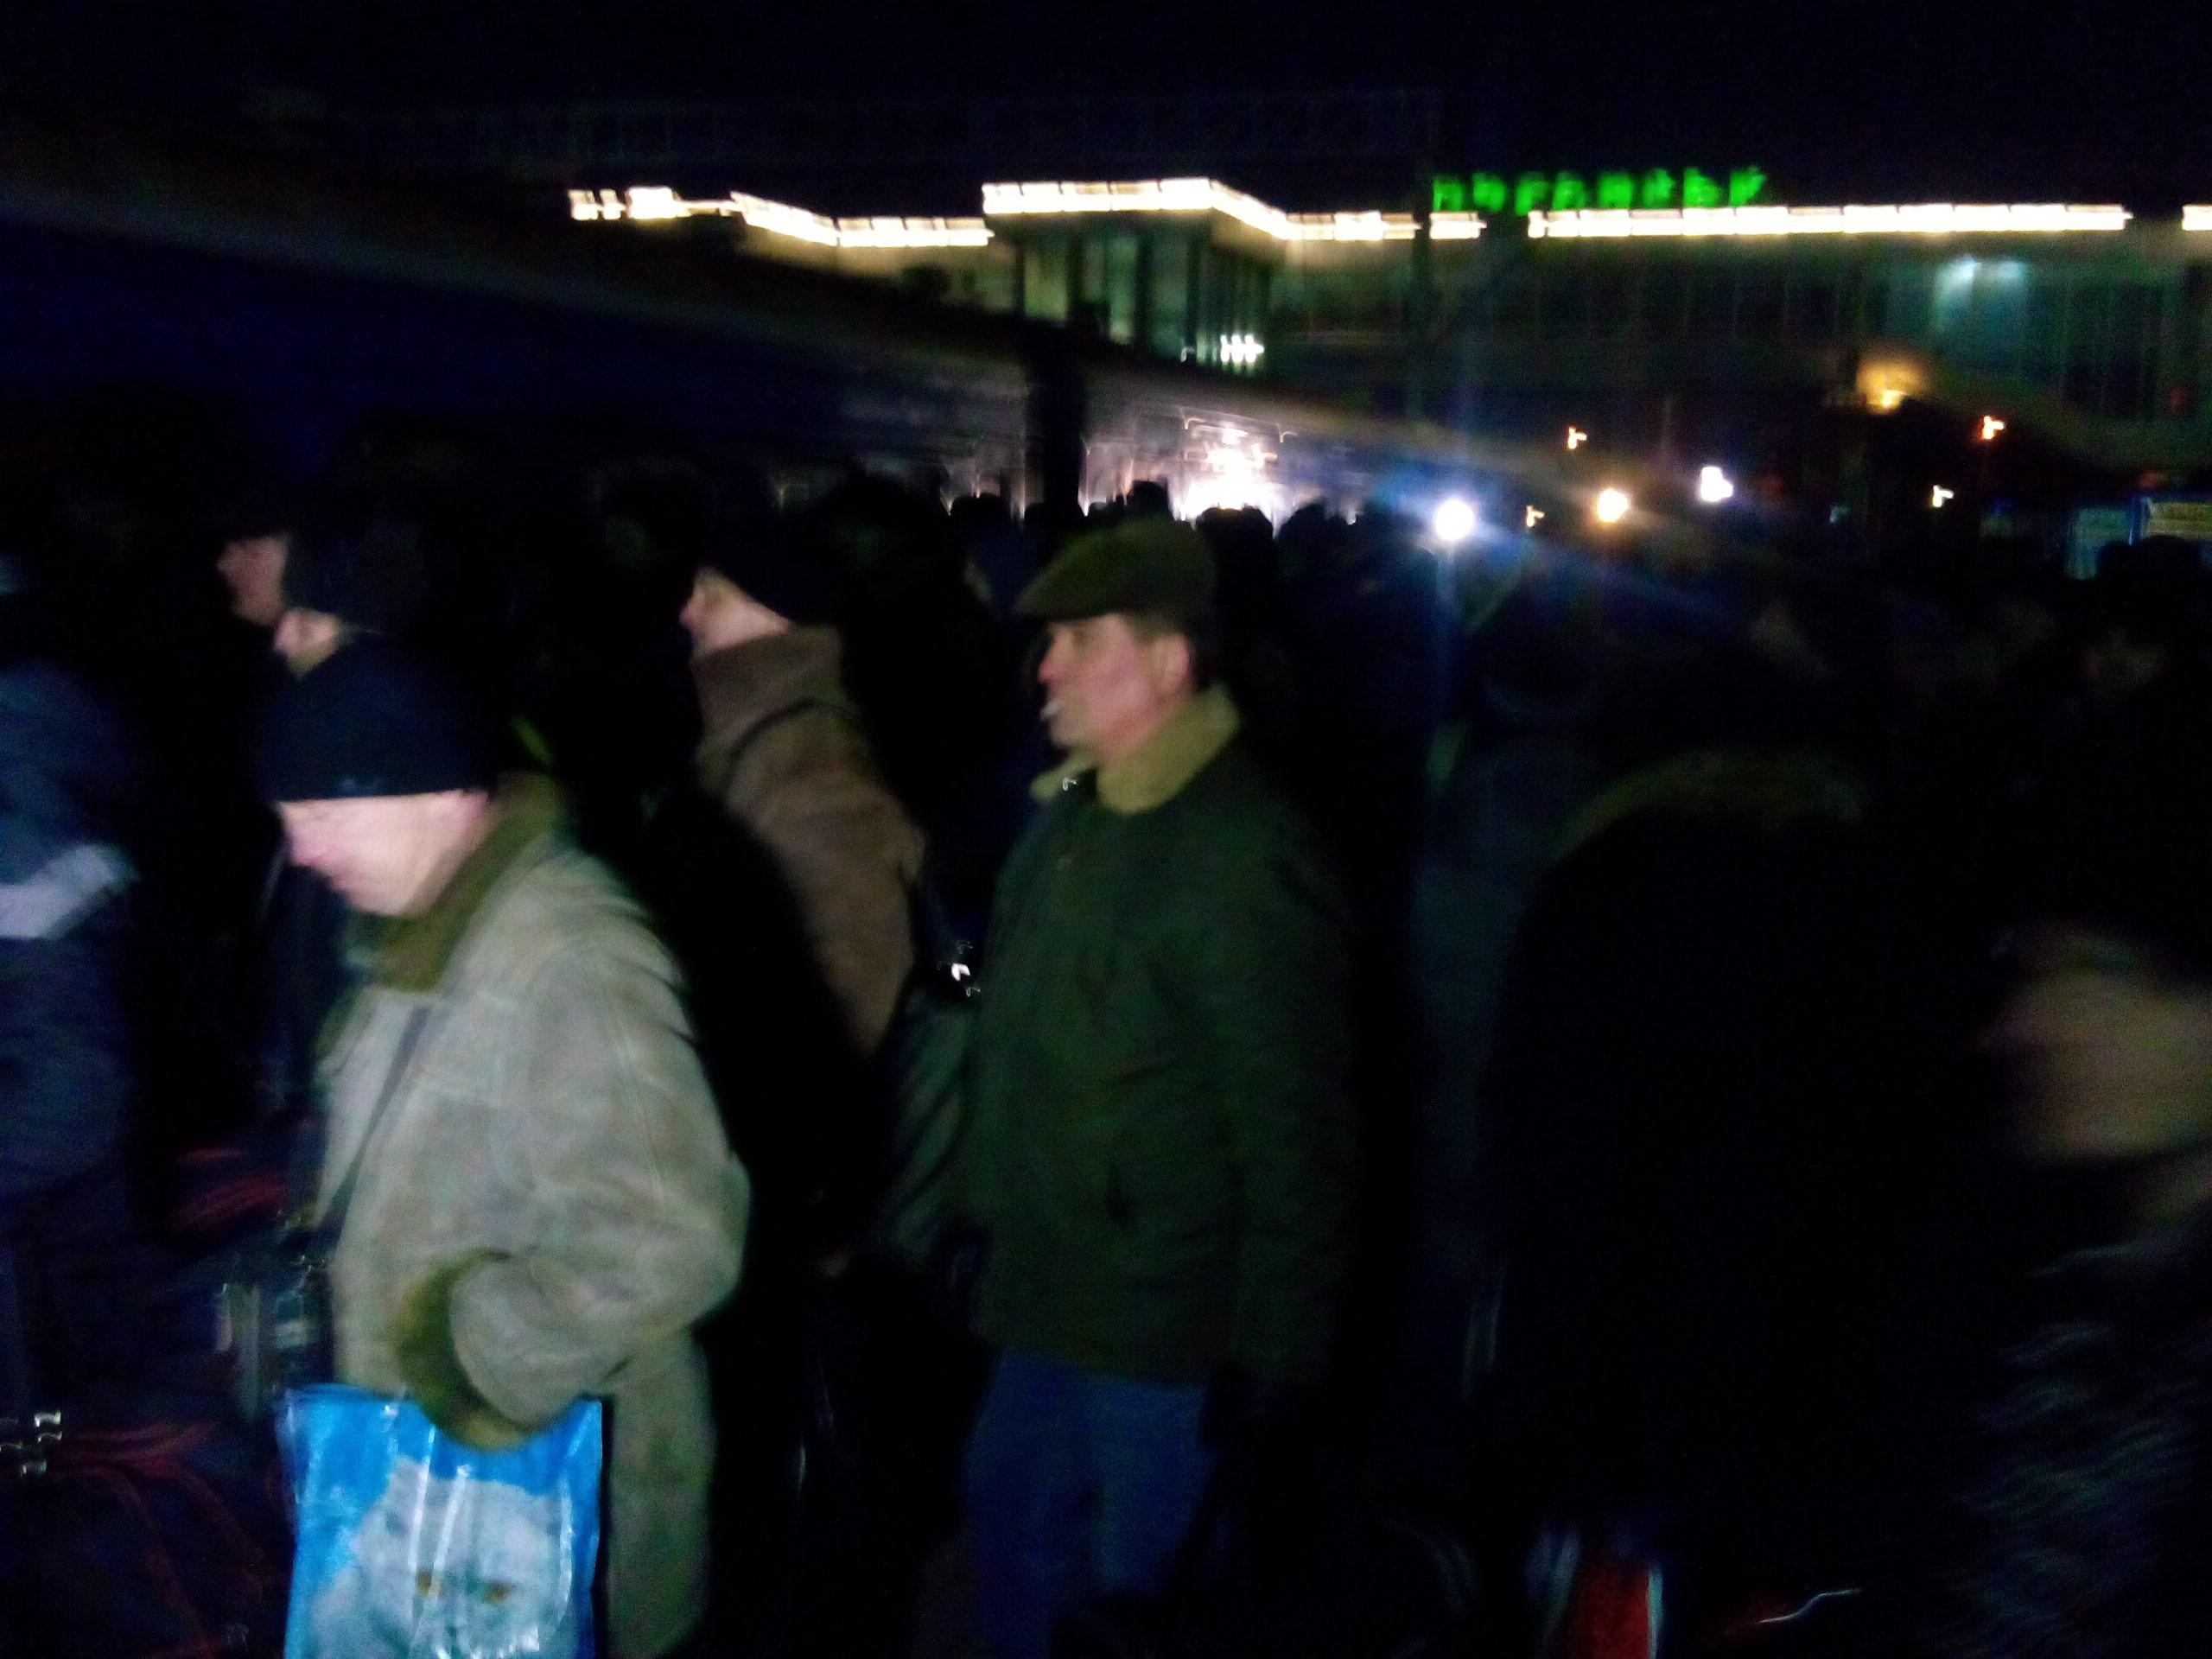 Луганских активистов провожают на Антимайдан в Киев +